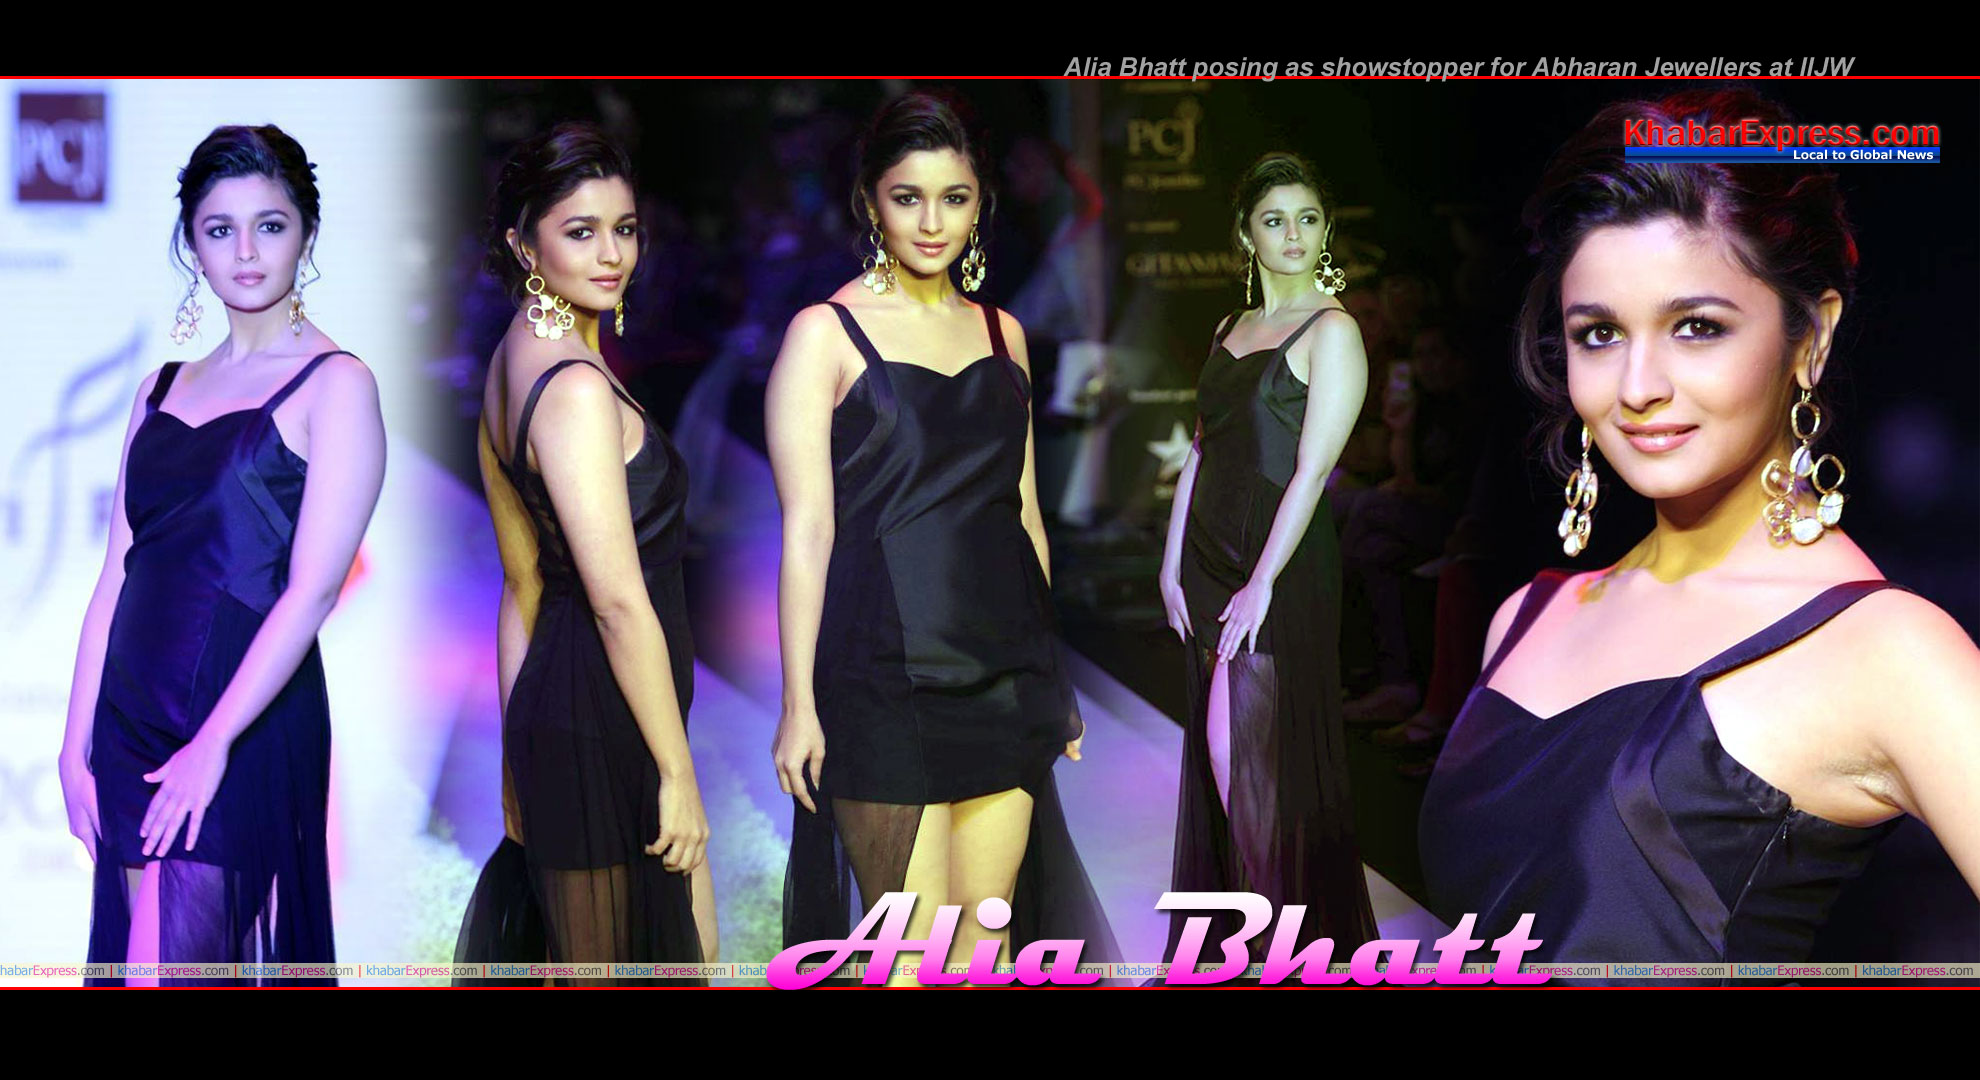 Bollywood hot and charming sensation Alia Bhatt